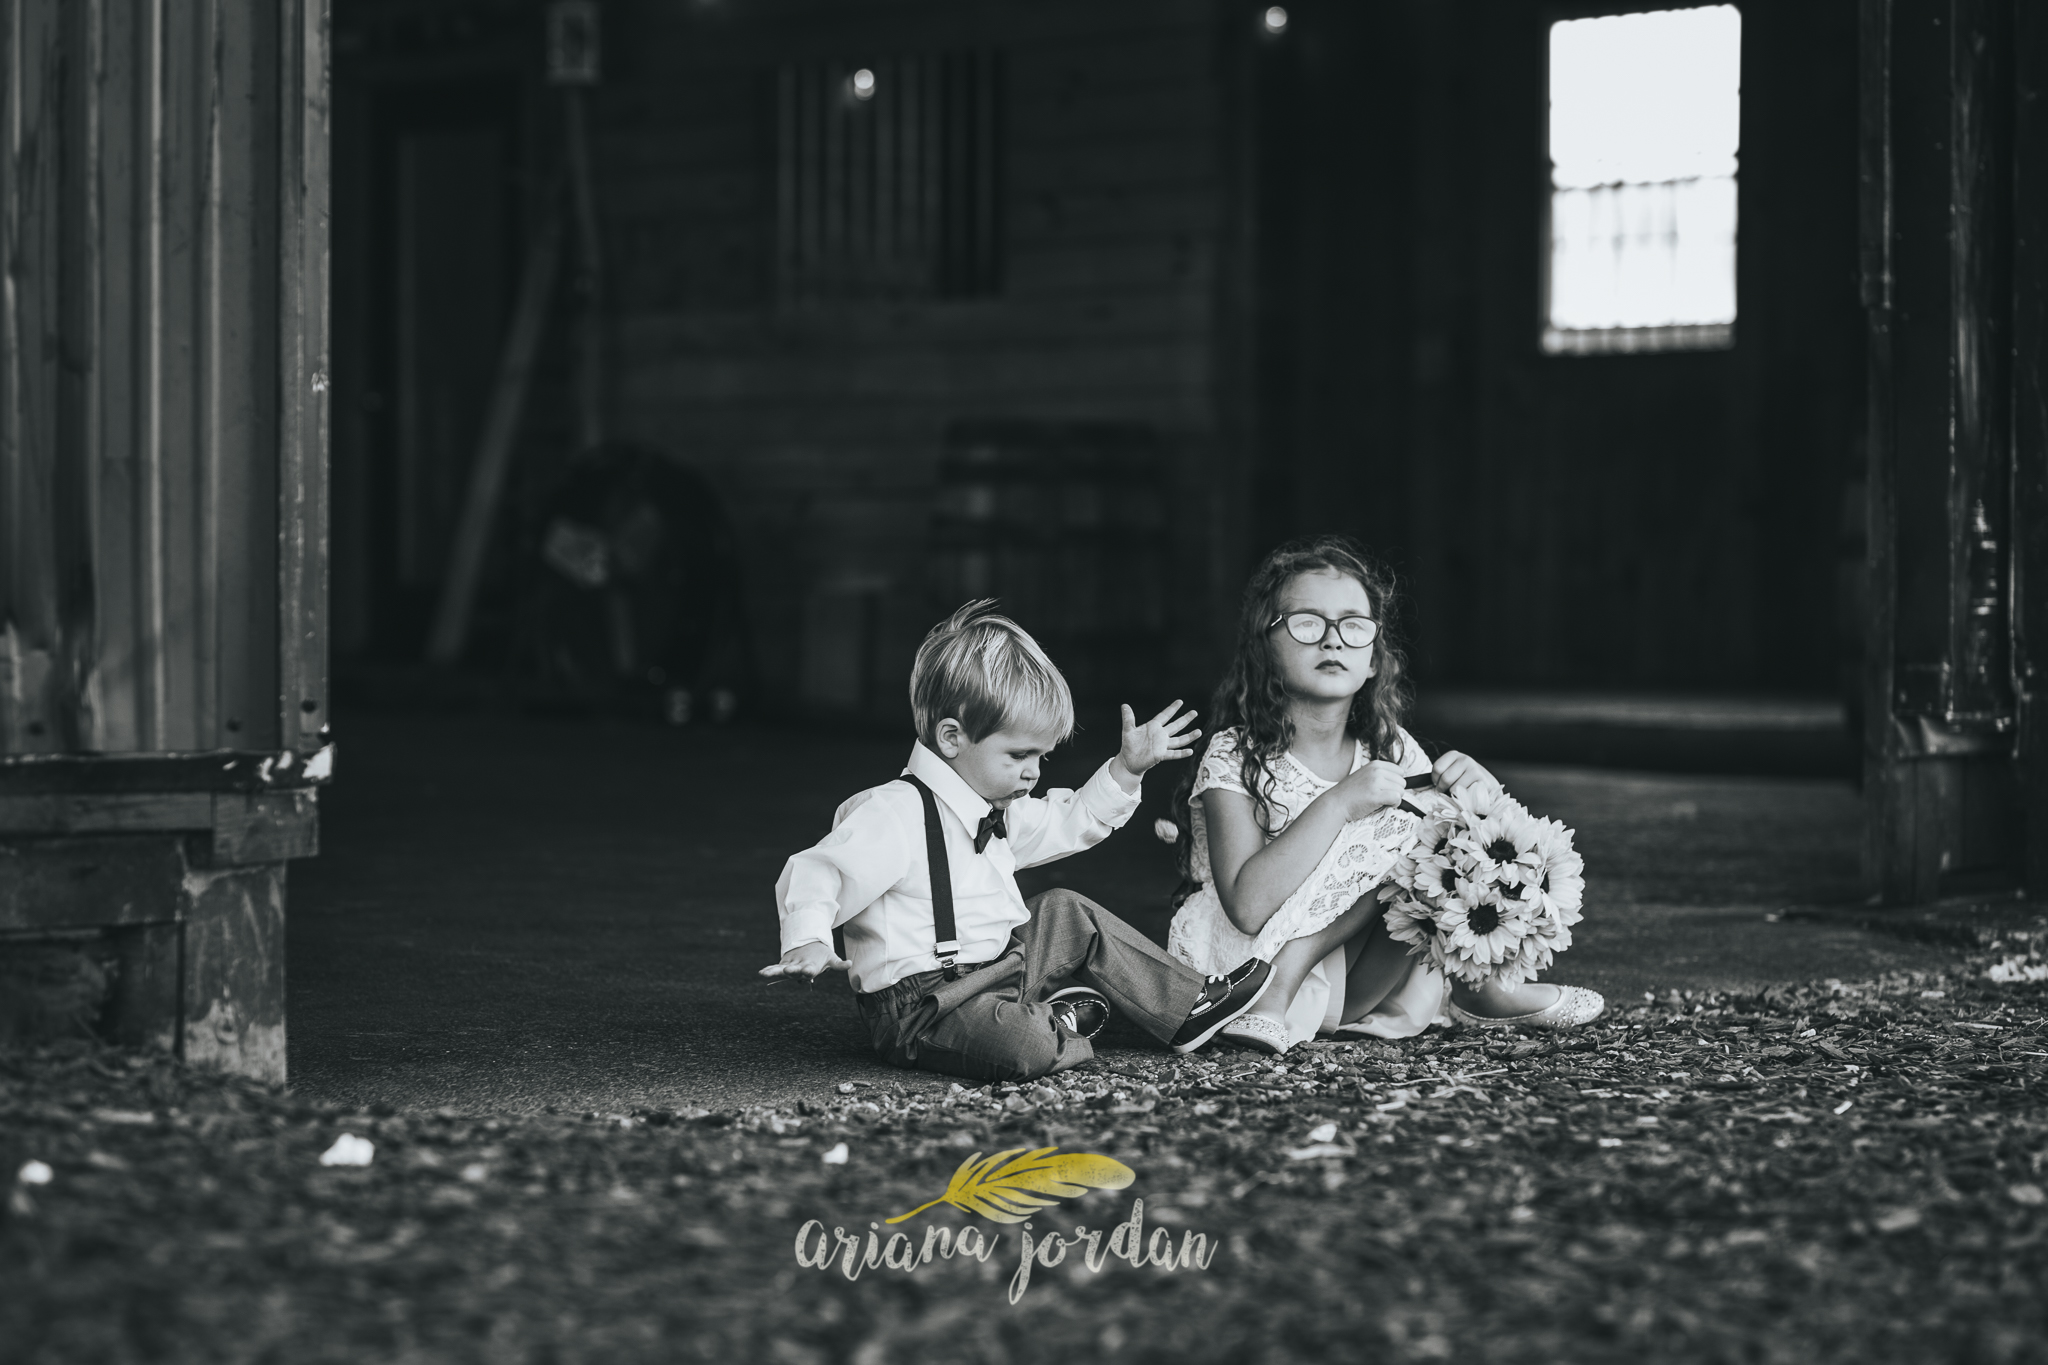 094 Ariana Jordan Photography -Moonlight Fields Lexington Ky Wedding Photographer 4775.jpg